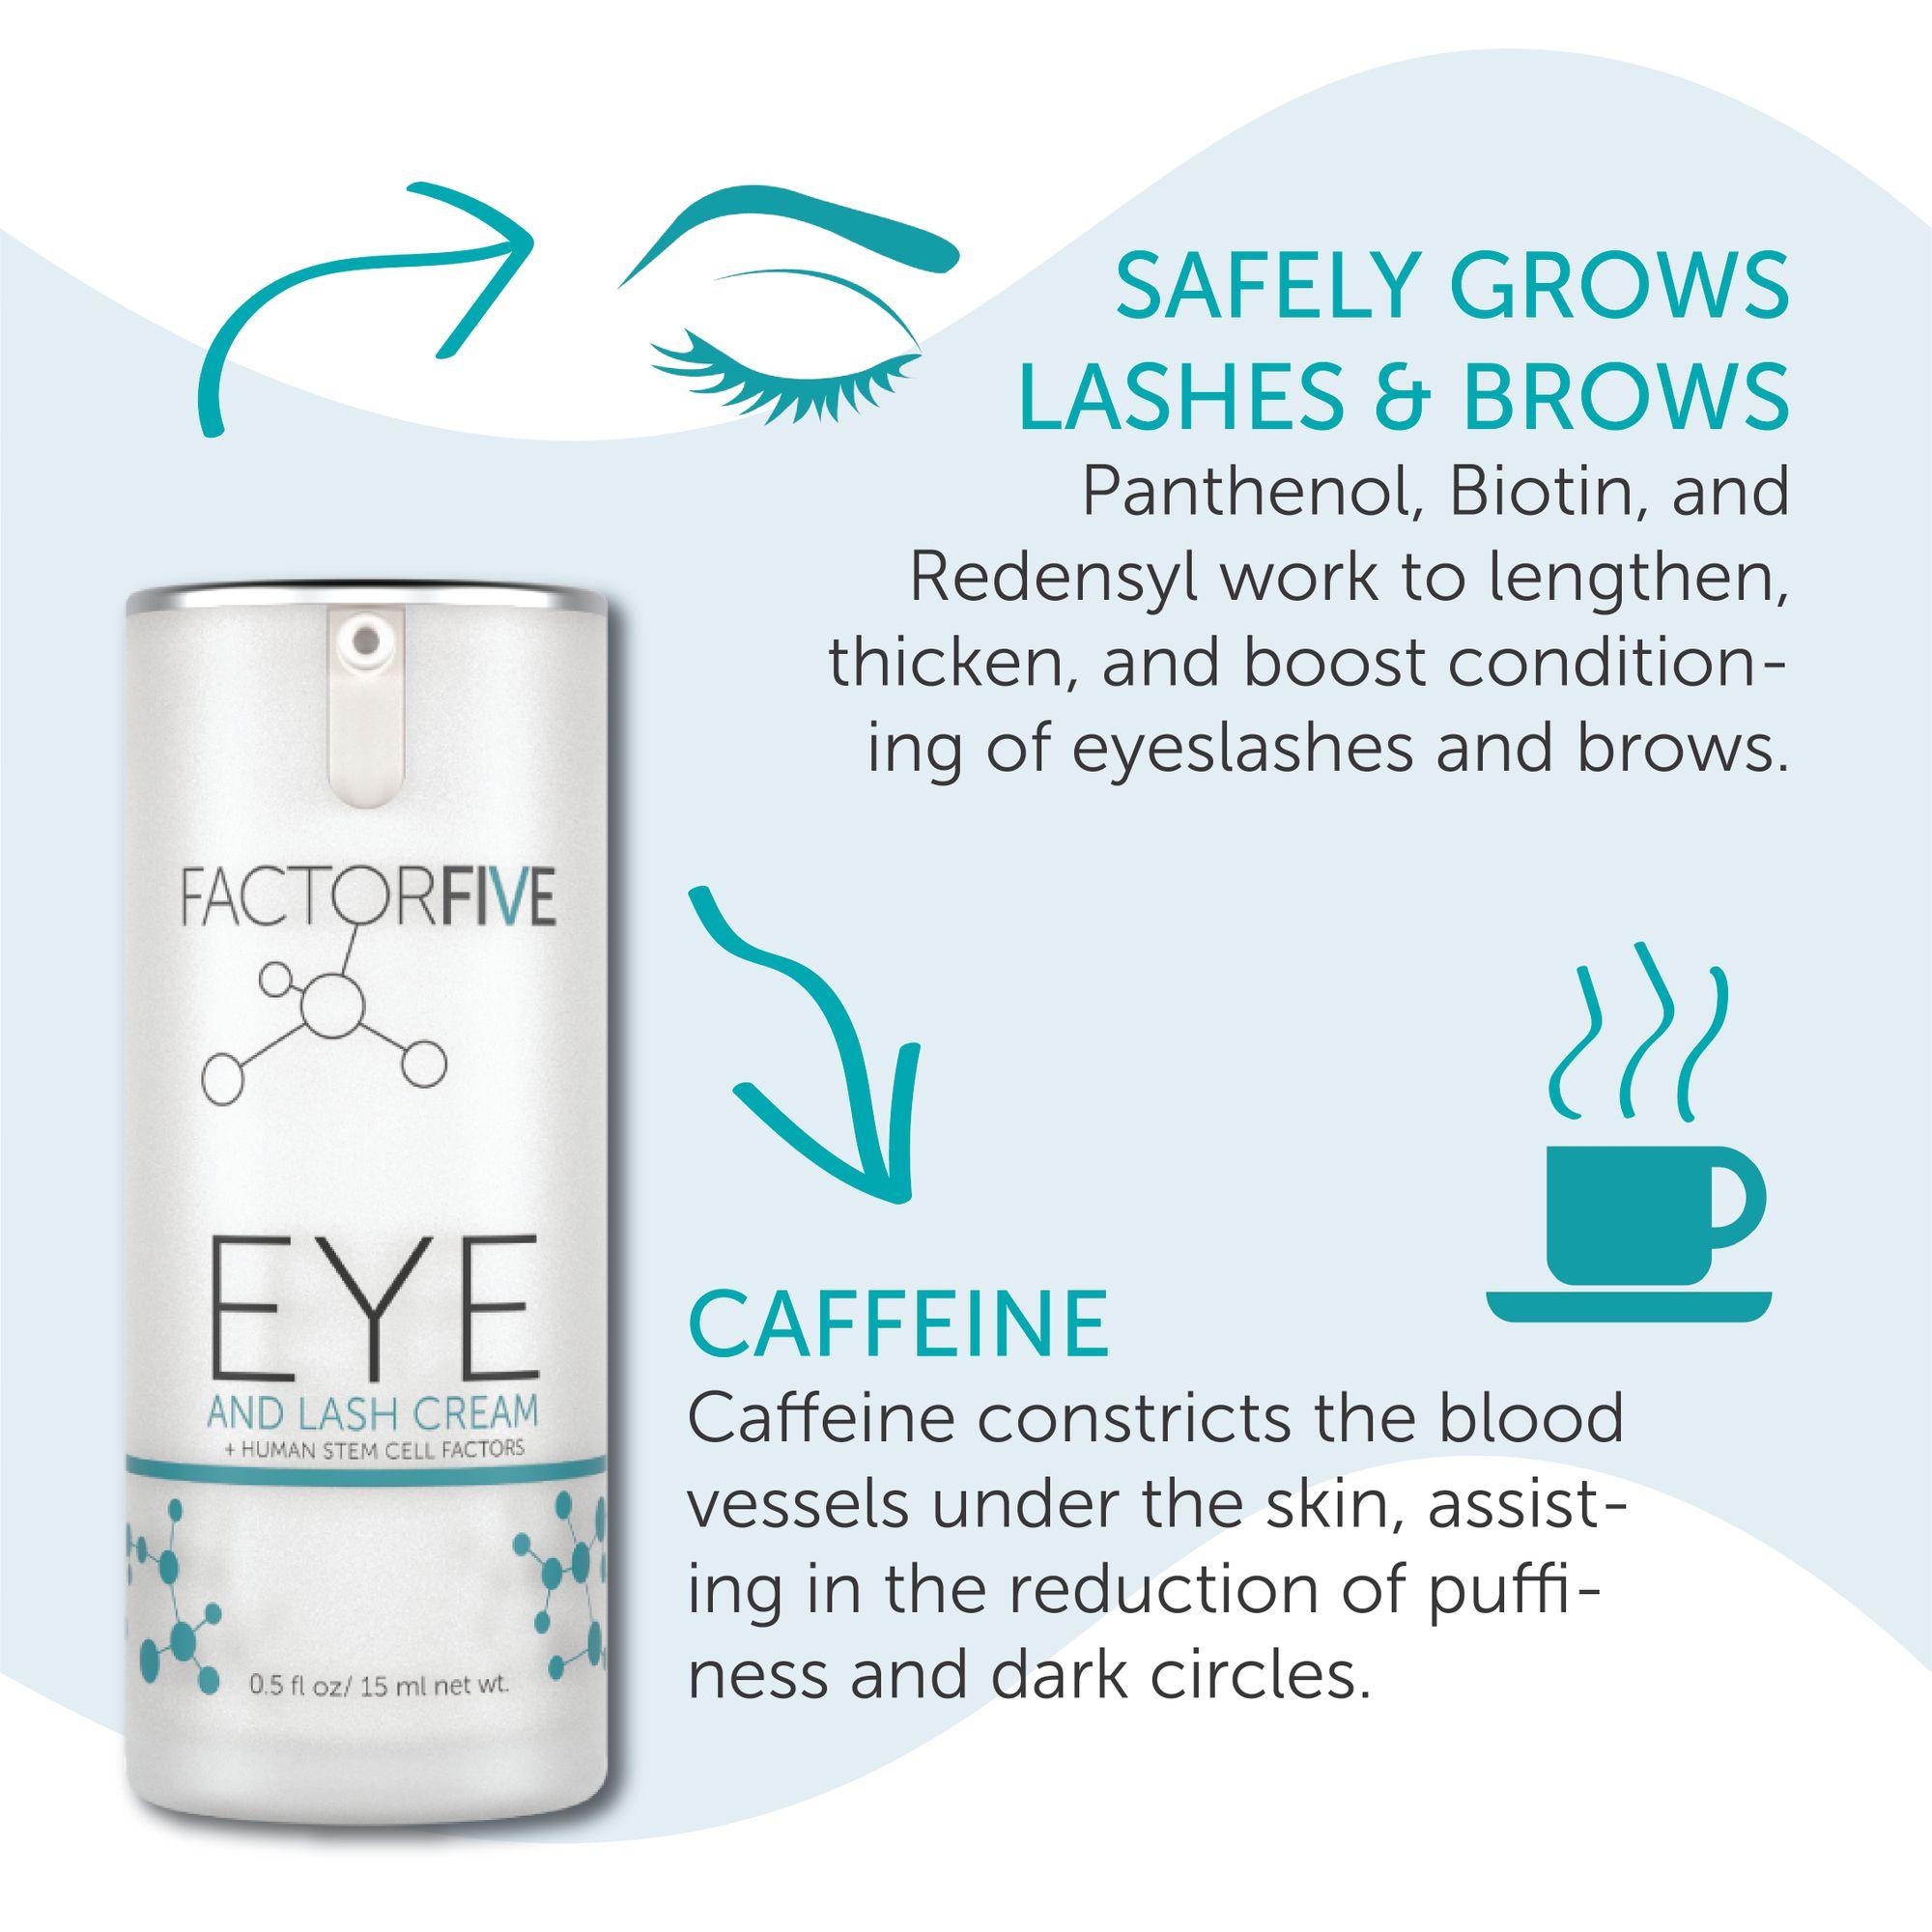 Eye Lash Cream In 2020 Grow Lashes Lashes Stem Cell Cream